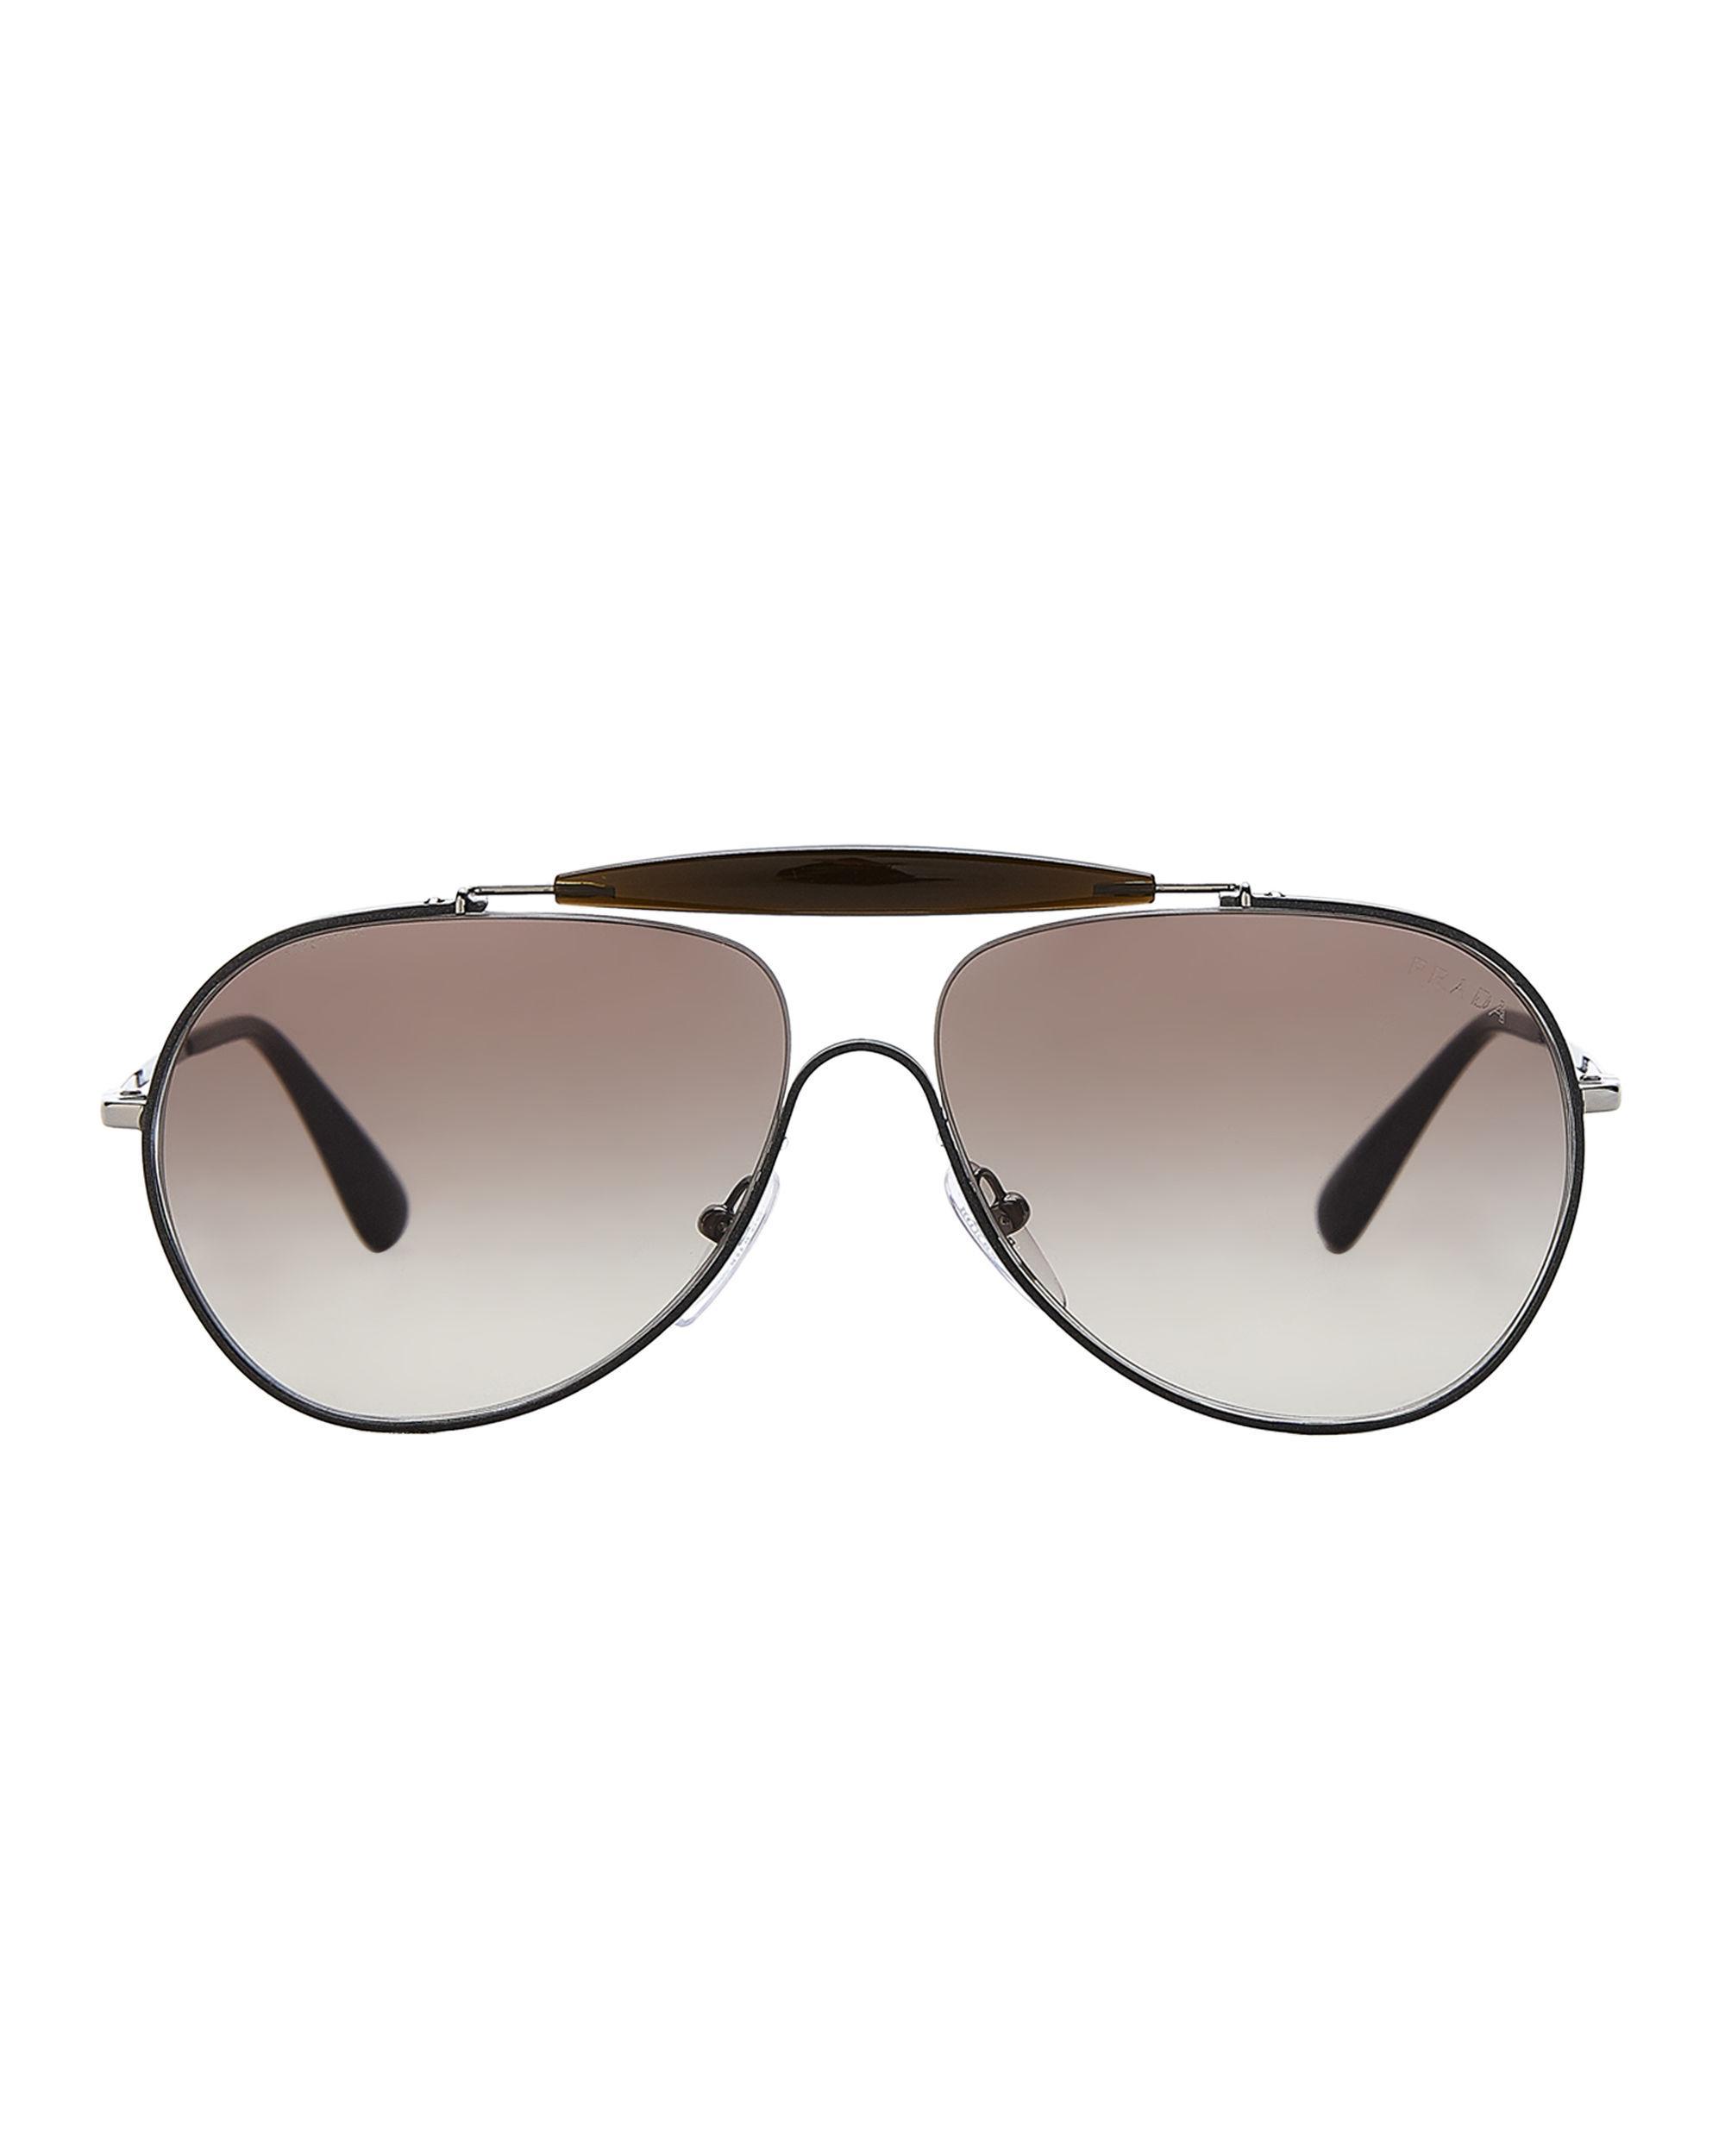 1d0d21ece9f7 Lyst - Prada Spr 56s Black Aviator Sunglasses in Black for Men